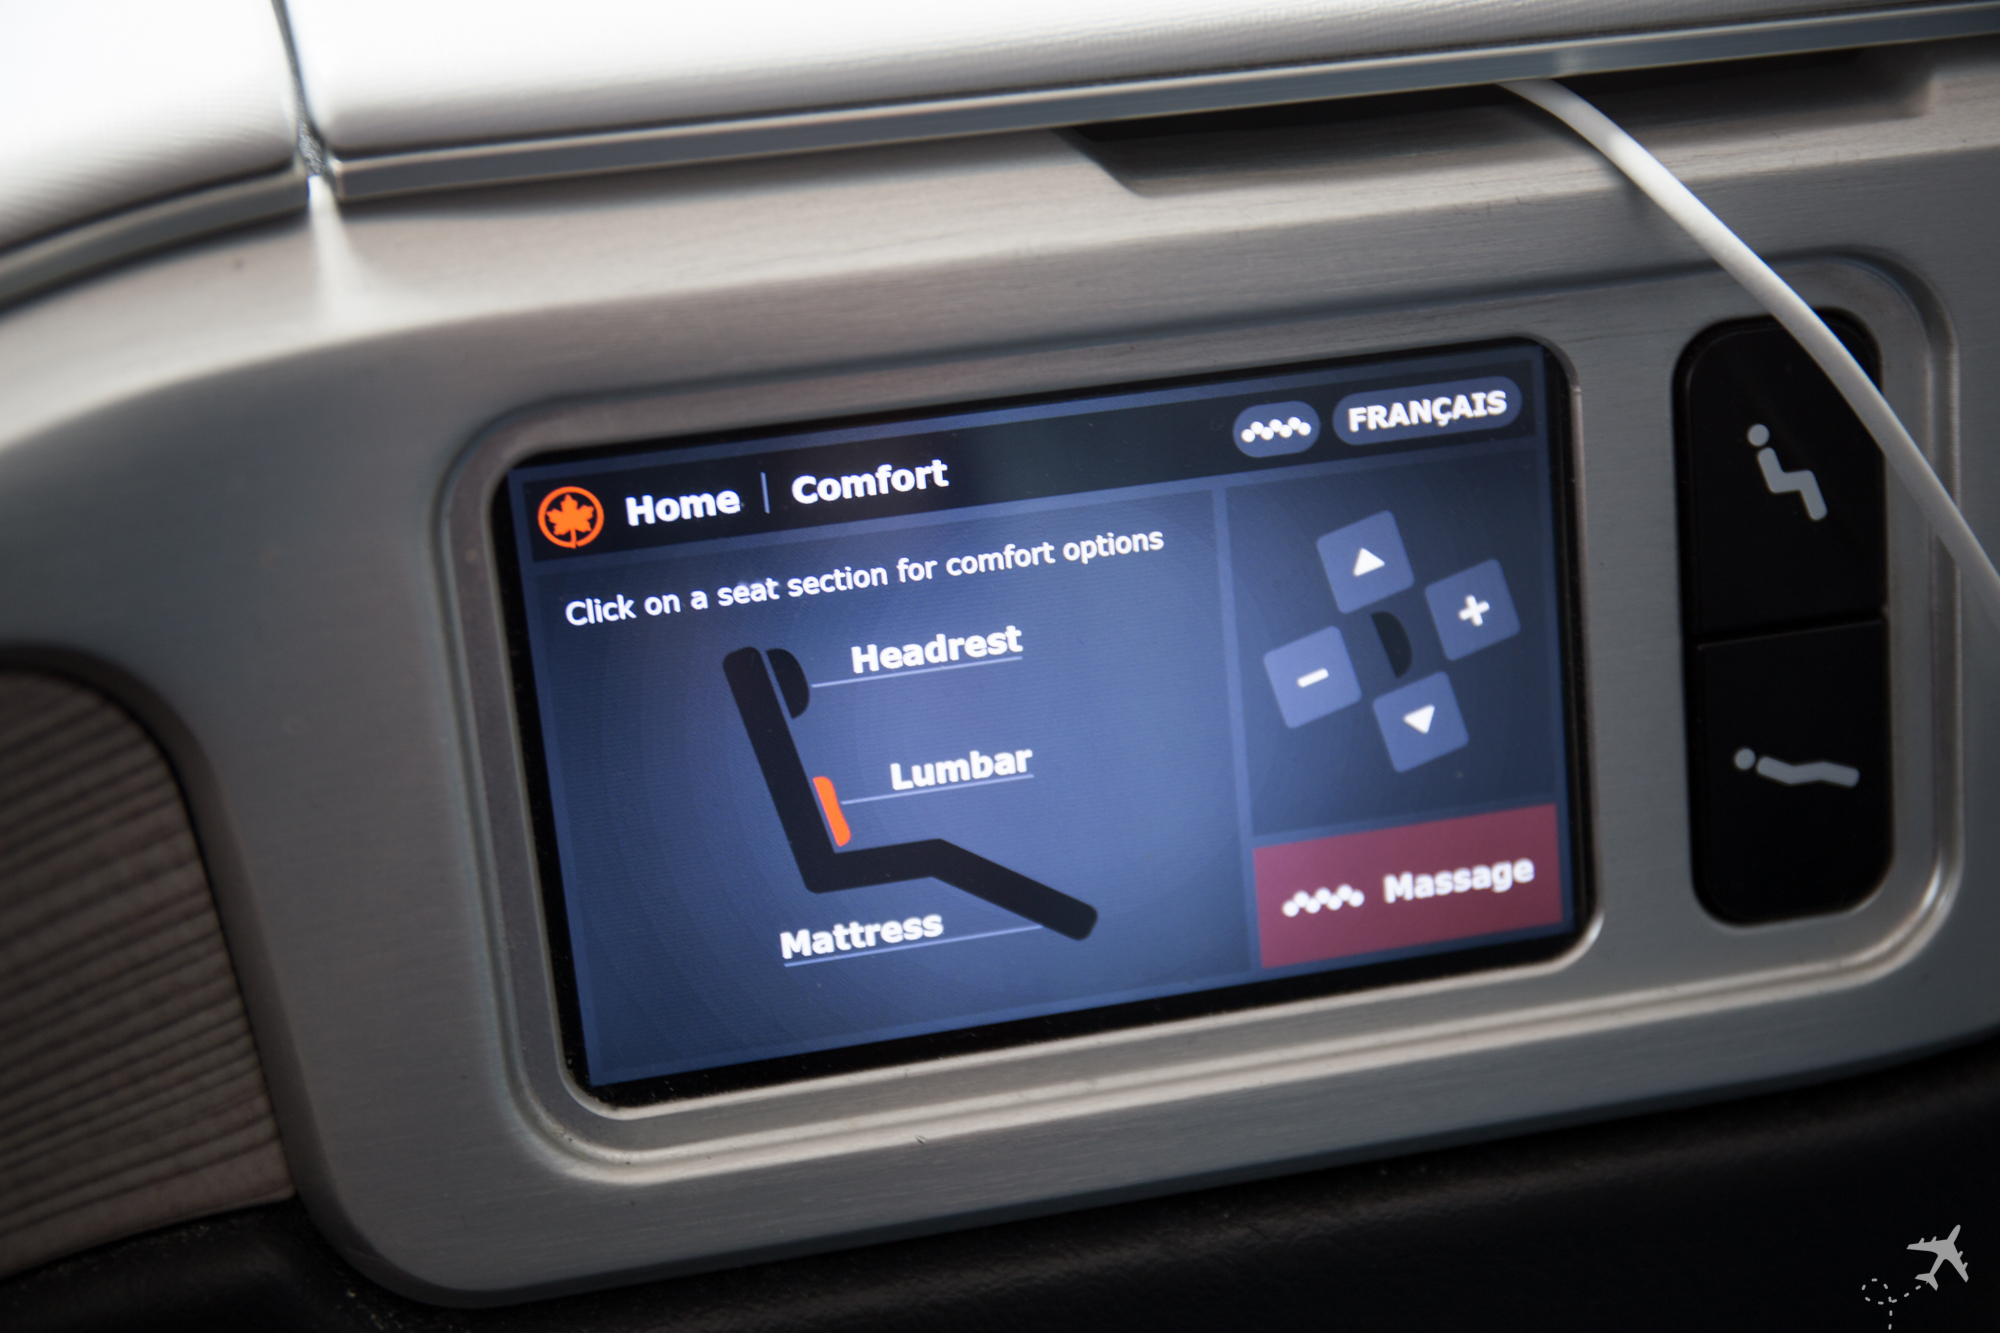 Air Canada Boeing 787-9 Business Class Control Comfort Lumbar